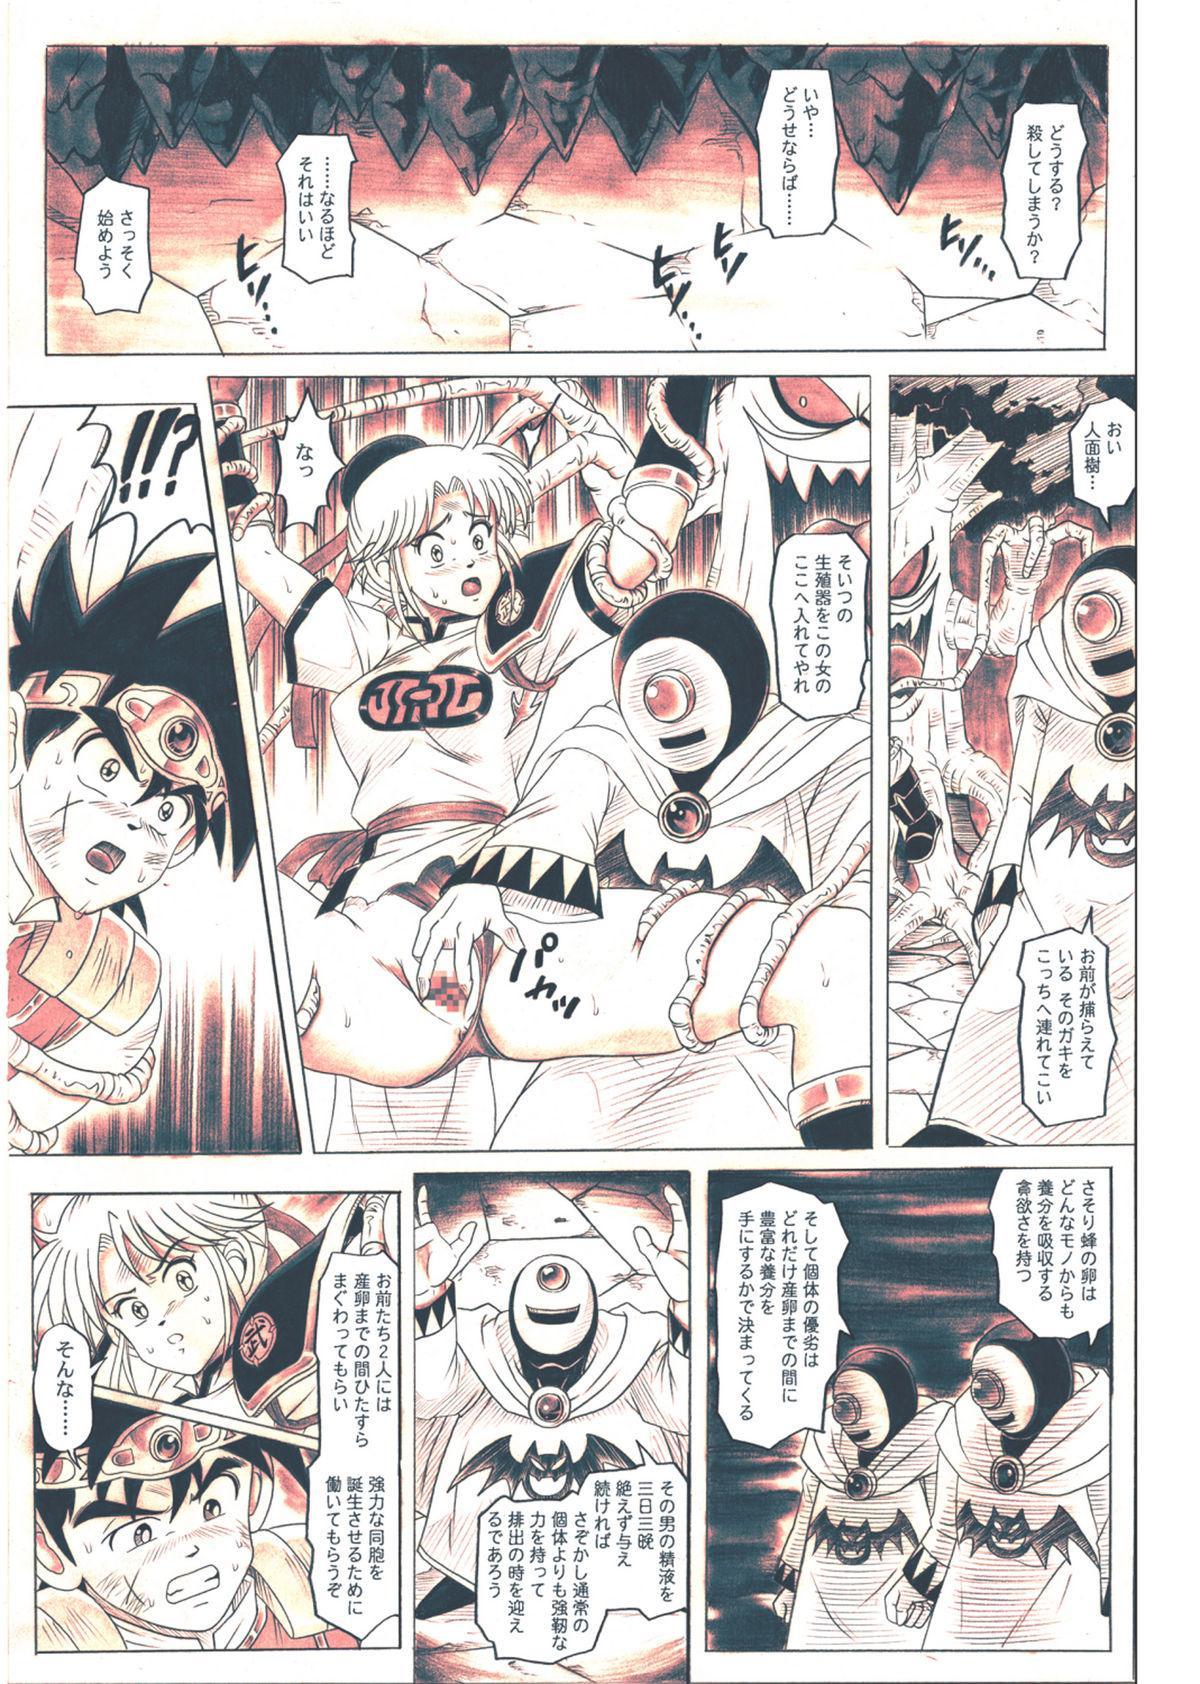 [Cyclone (Reizei, Izumi)] STAR TAC IDO ~Youkuso Haja no Doukutsu he~ Chuuhen Download edition (Dragon Warrior: Dai's Great Adventure) [Digital] 100